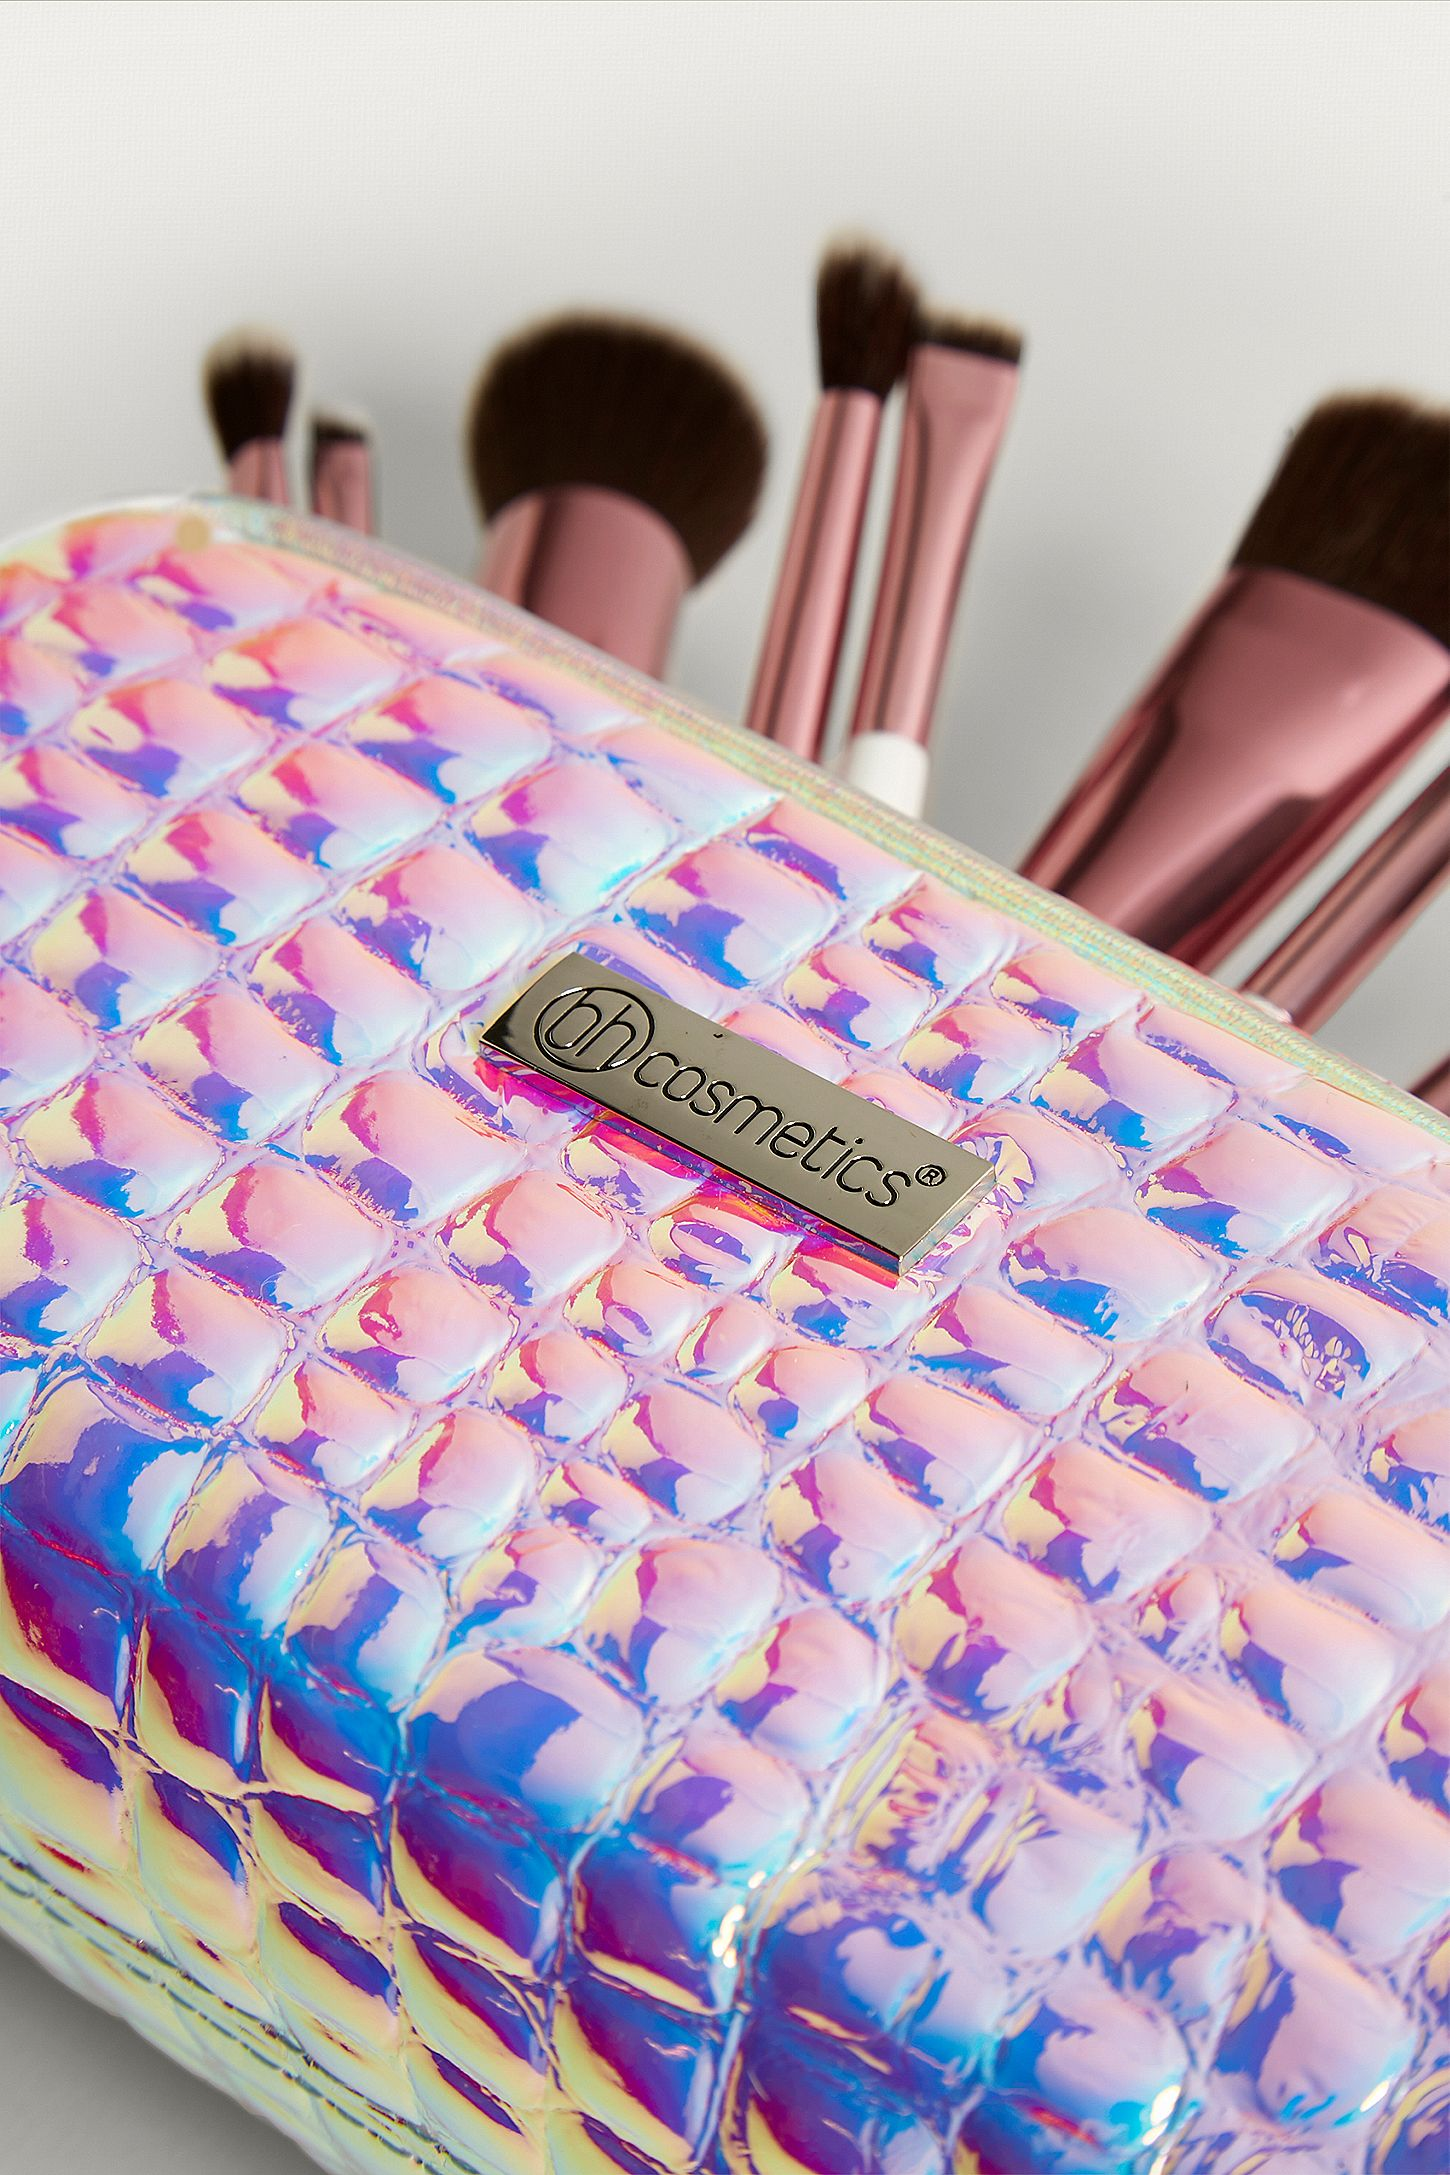 Bh Cosmetics 12 Teiliges Pinselset Crystal Quartz Urban